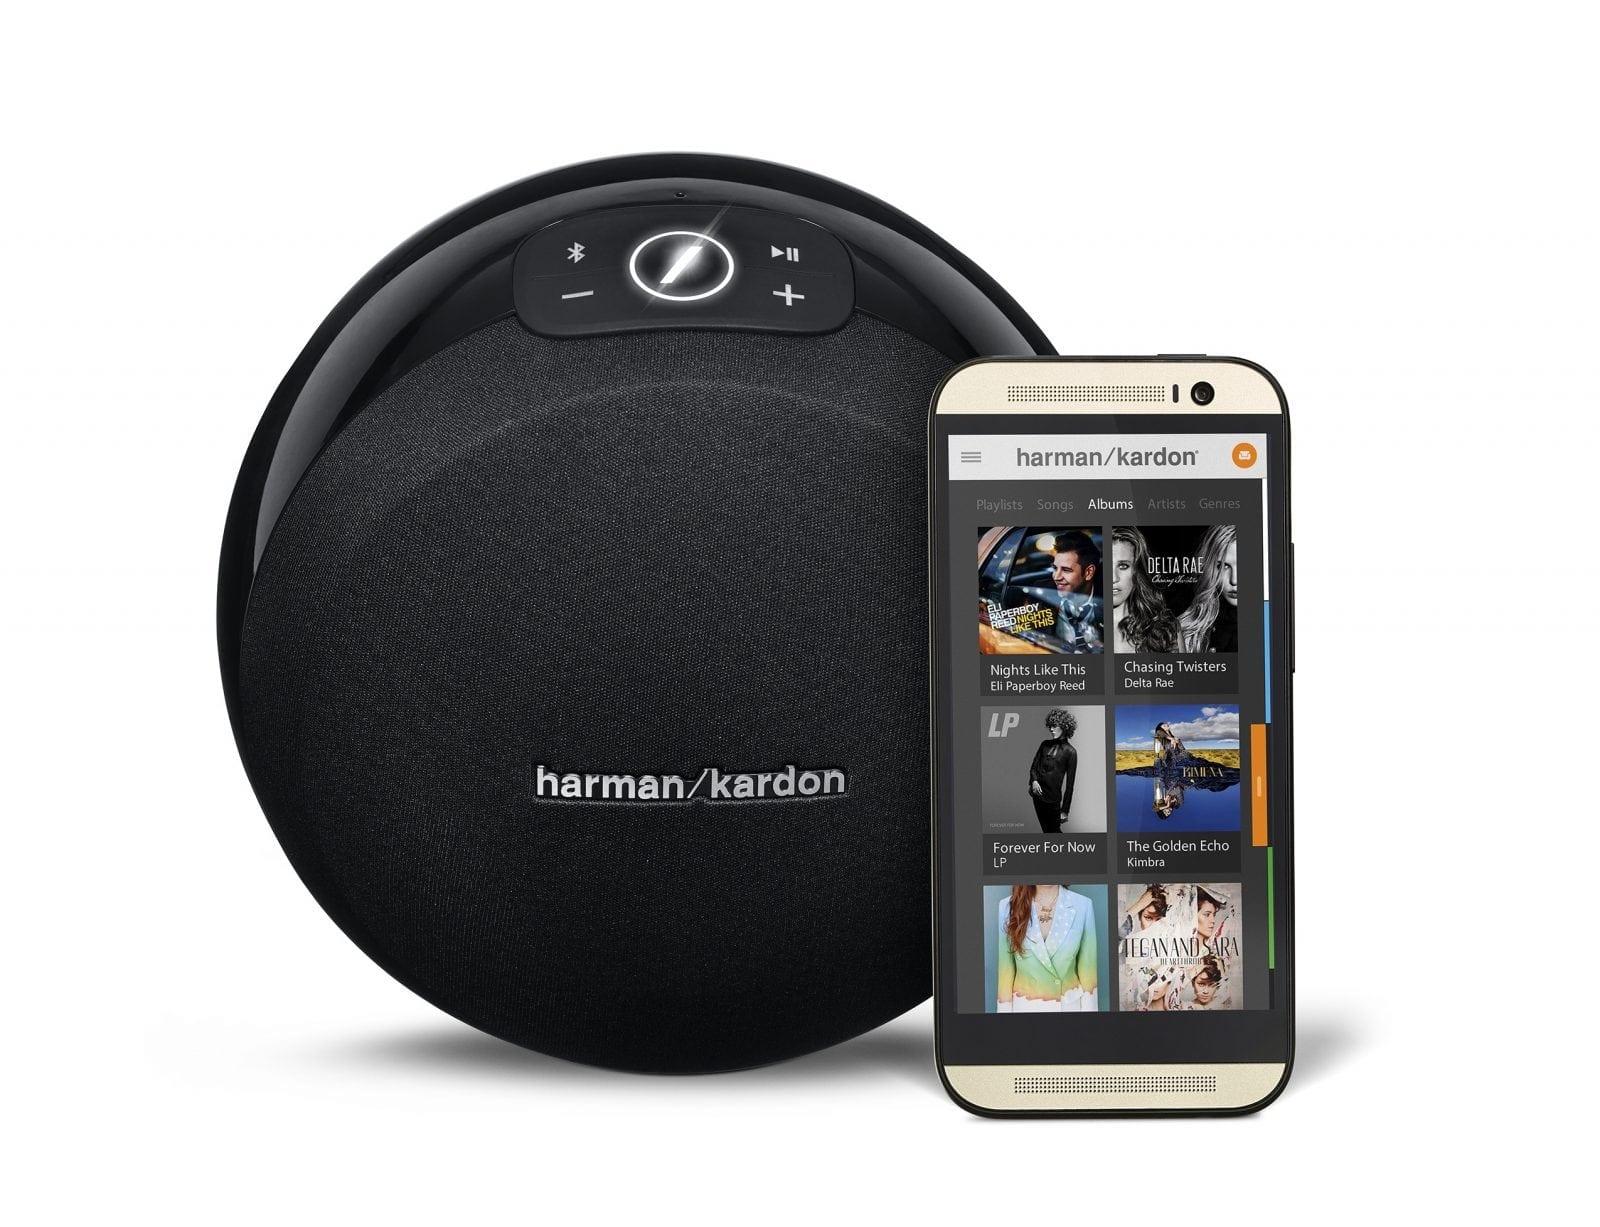 Harman Kardon Omni 10 Black Front View w Phone - Harman Kardon Omni: Speaker Wireless HD